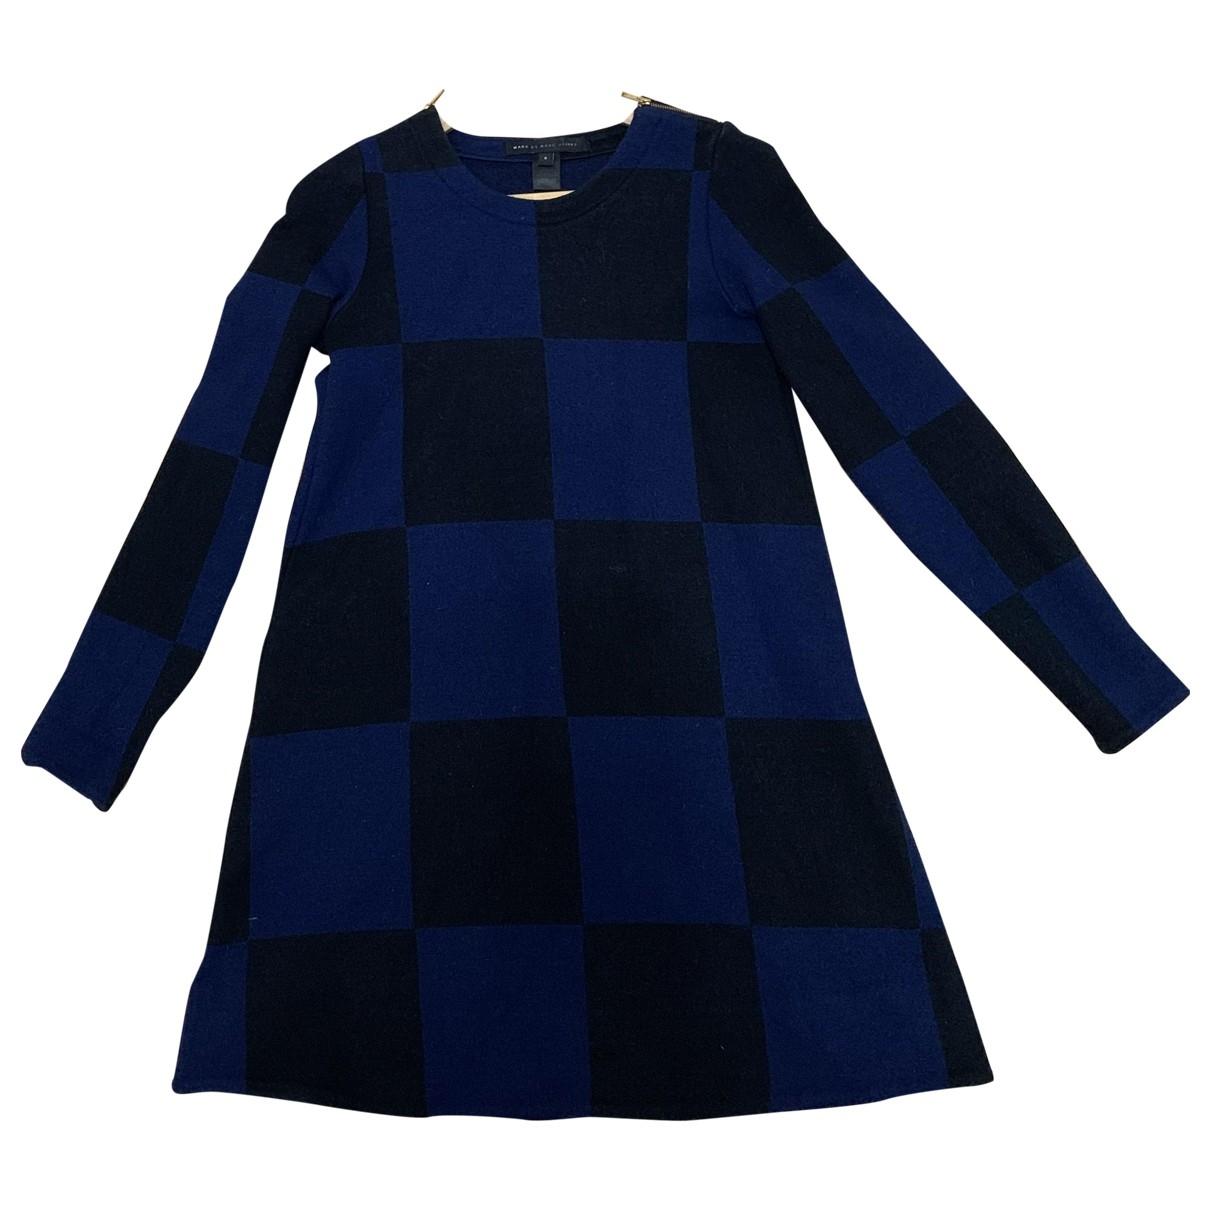 Marc By Marc Jacobs \N Blue Wool dress for Women S International